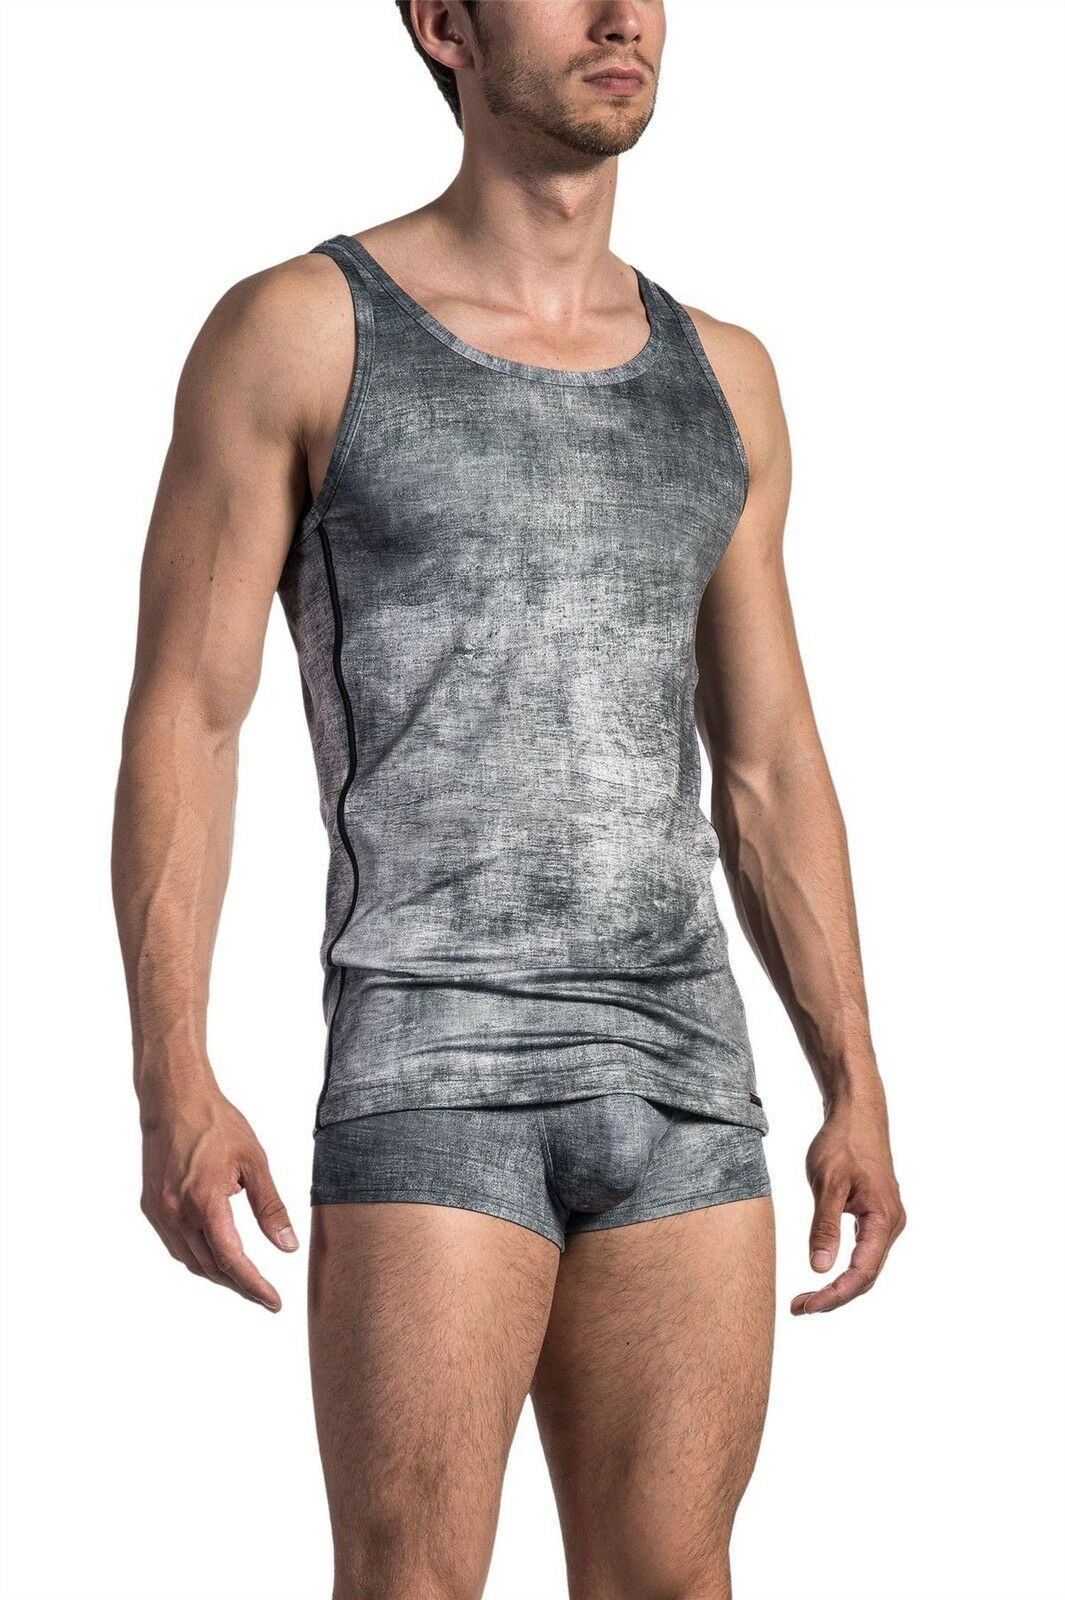 Olaf Benz ROT 1674 Sport Shirt Designer  Herren Gym Vest Top